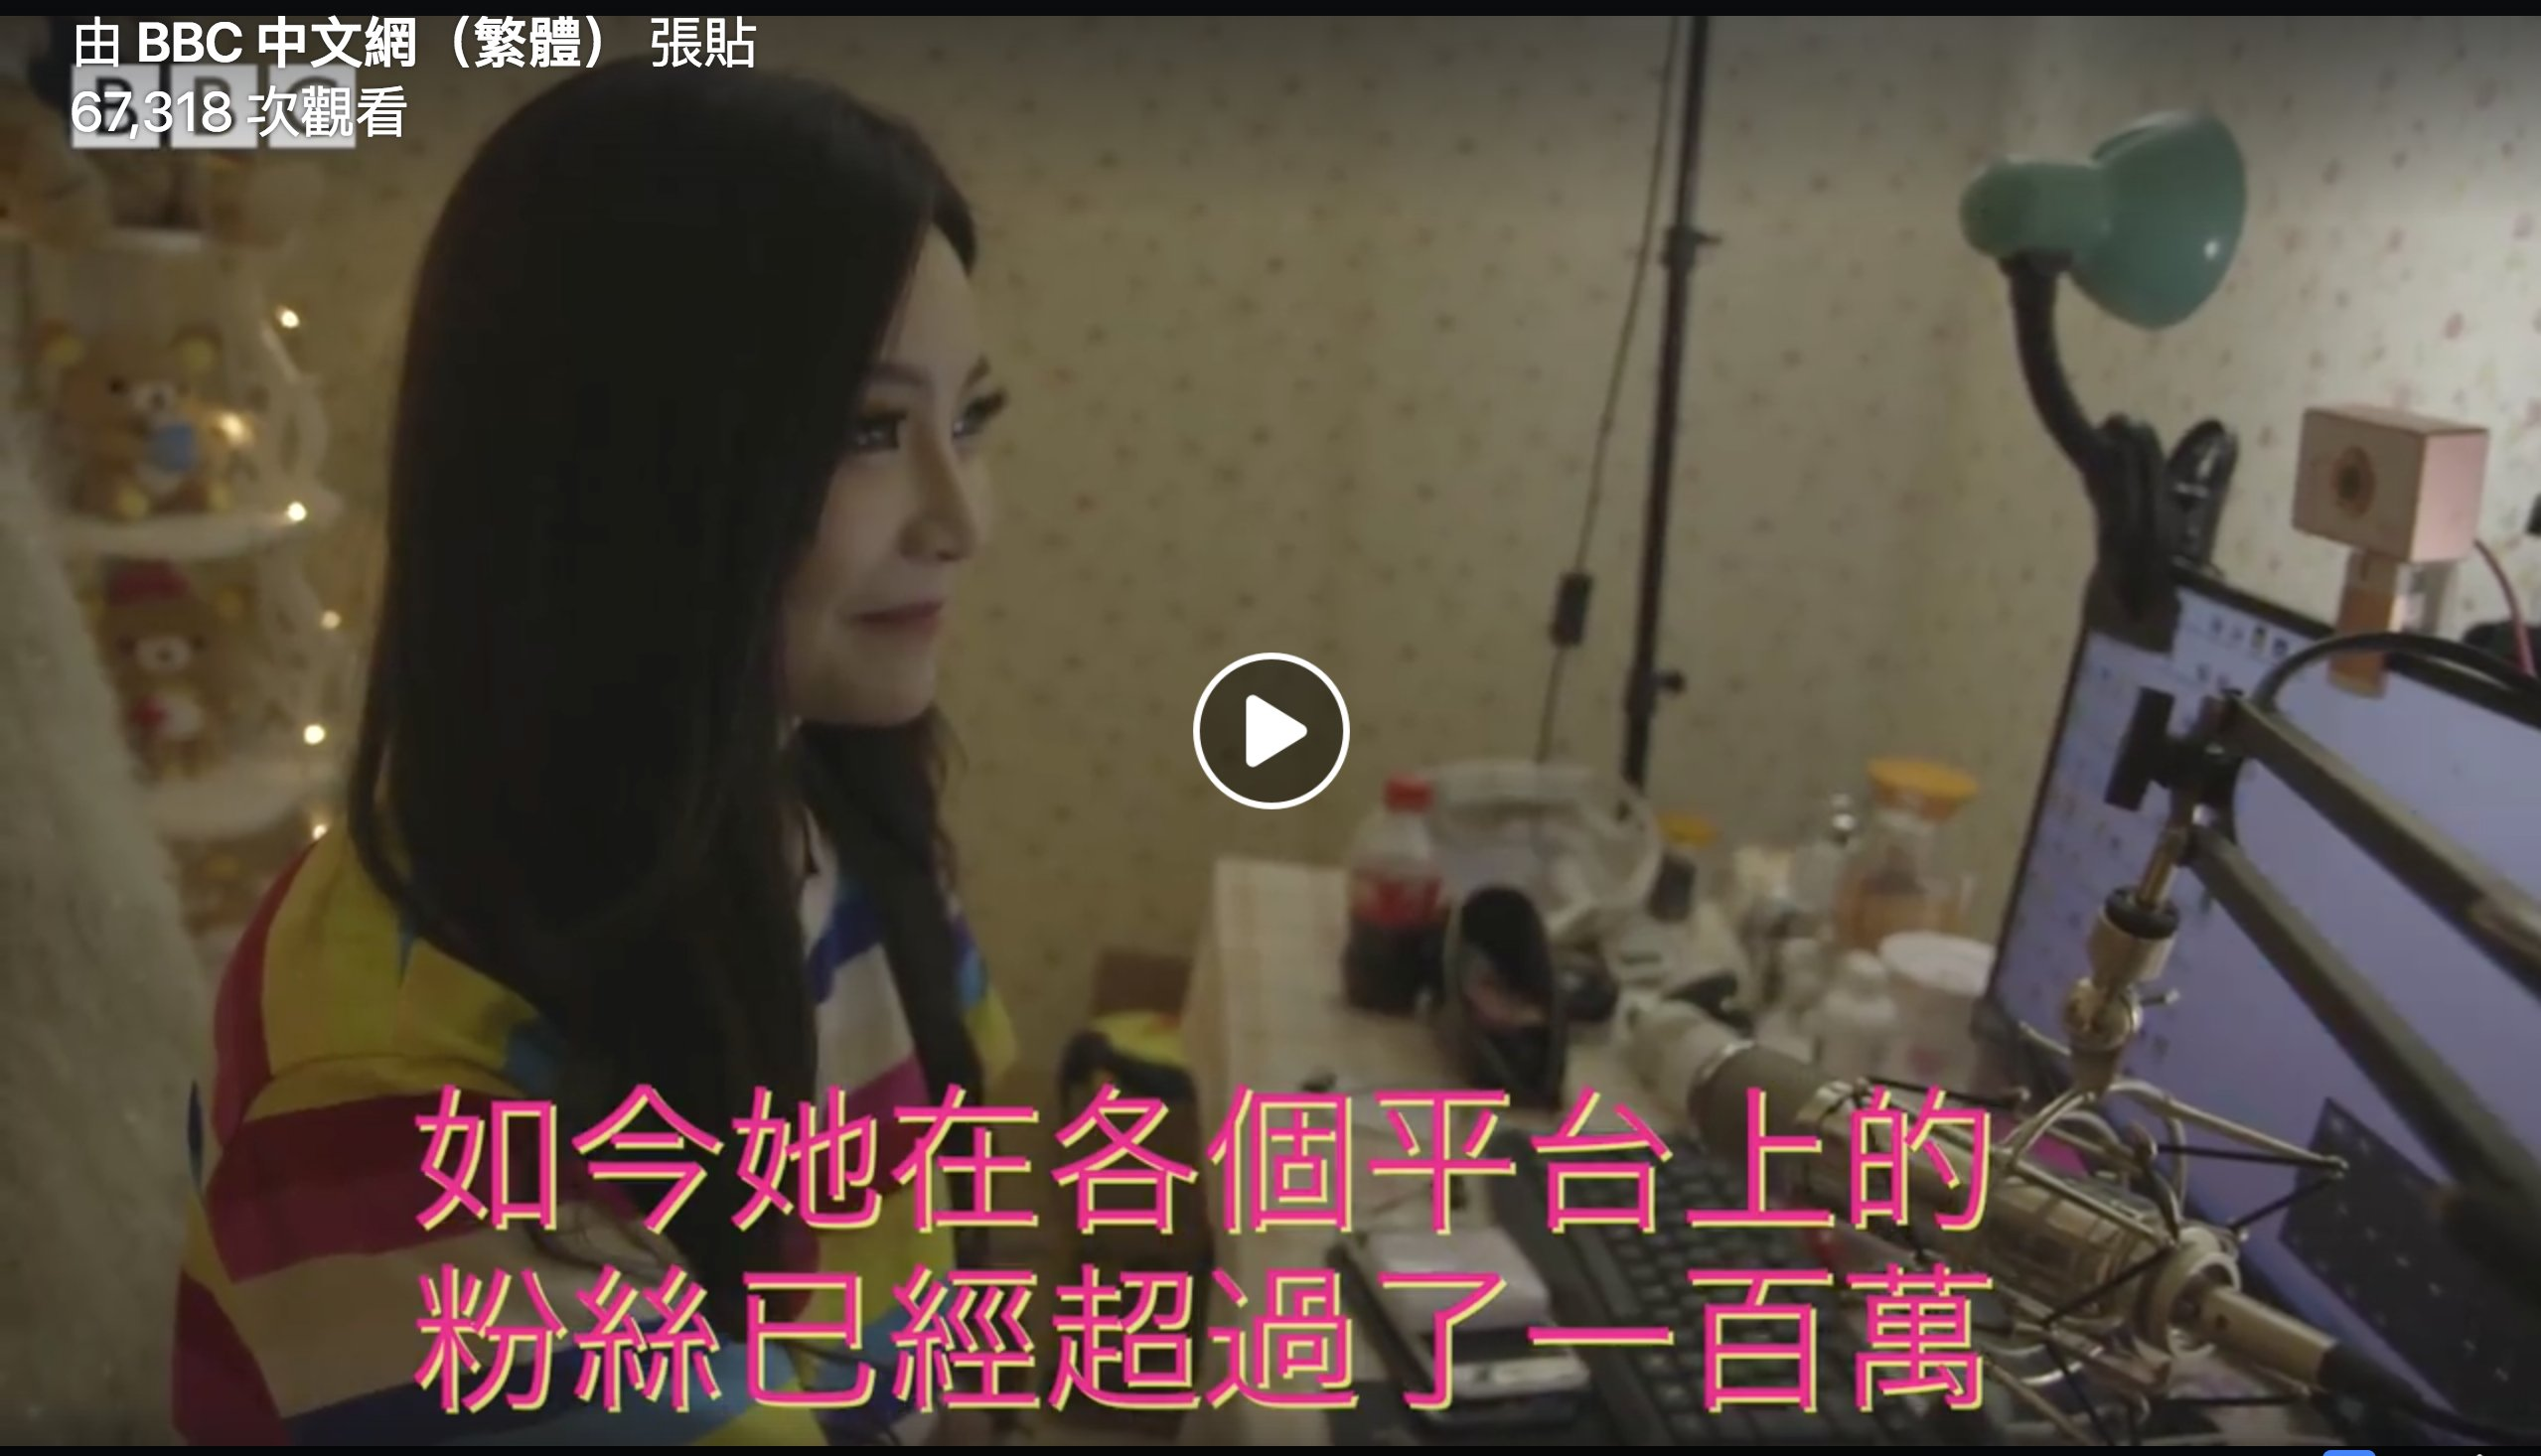 screen shot 2018 10 25 at 3 31 17 pm.png?resize=412,232 - 直播真的那麼好做?BBC記錄中國網絡女主播背後的辛酸故事「直播主的人生」!